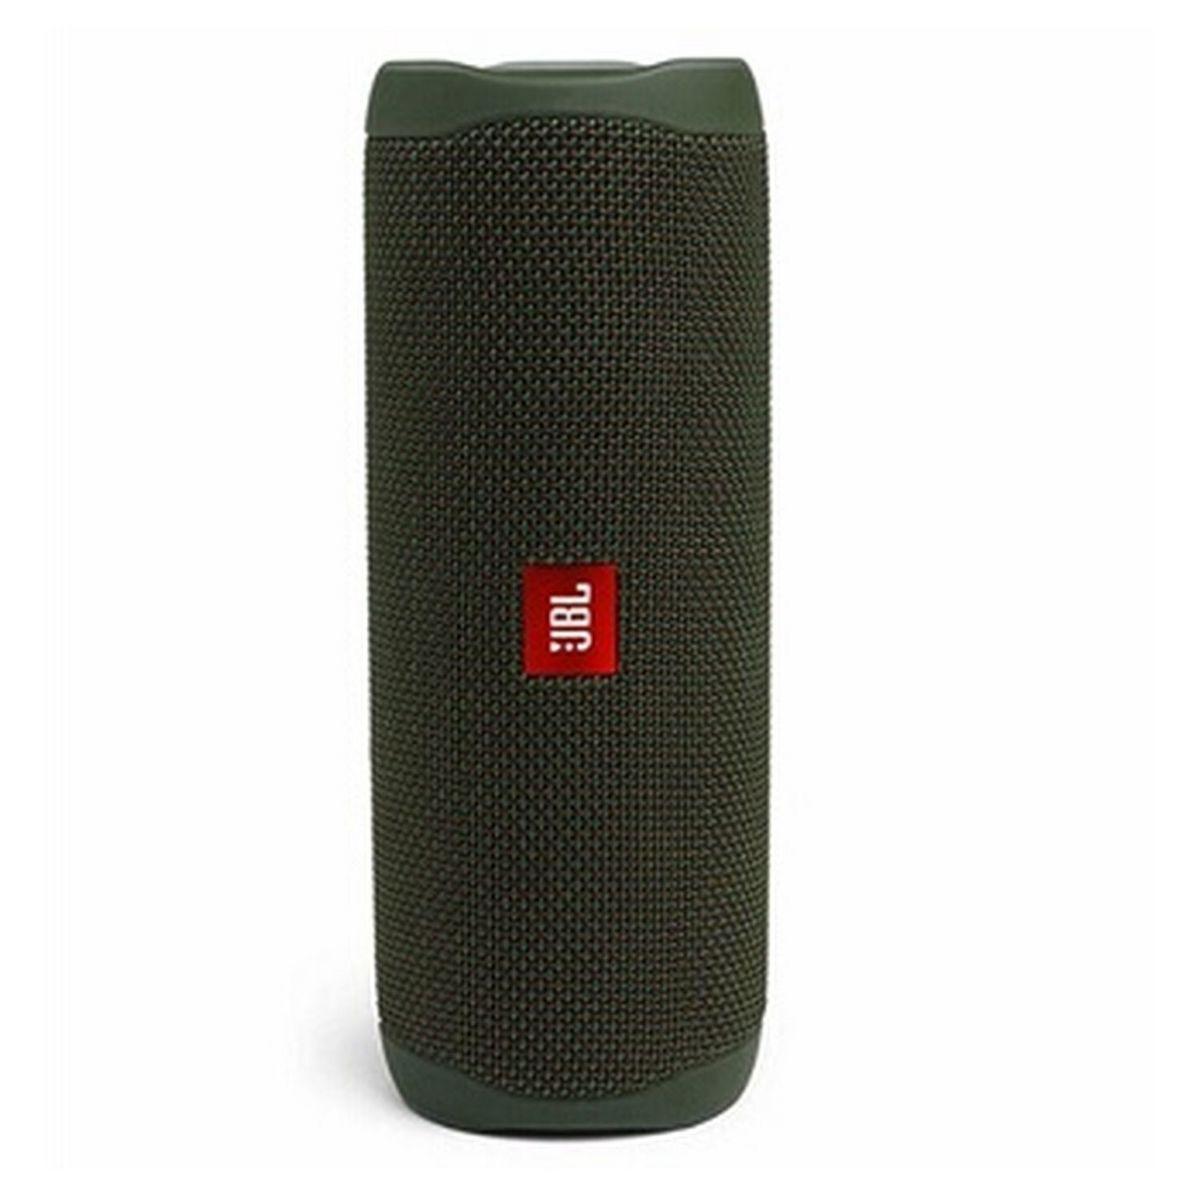 Enceinte portable Bluetooth - Kaki - Flip 5